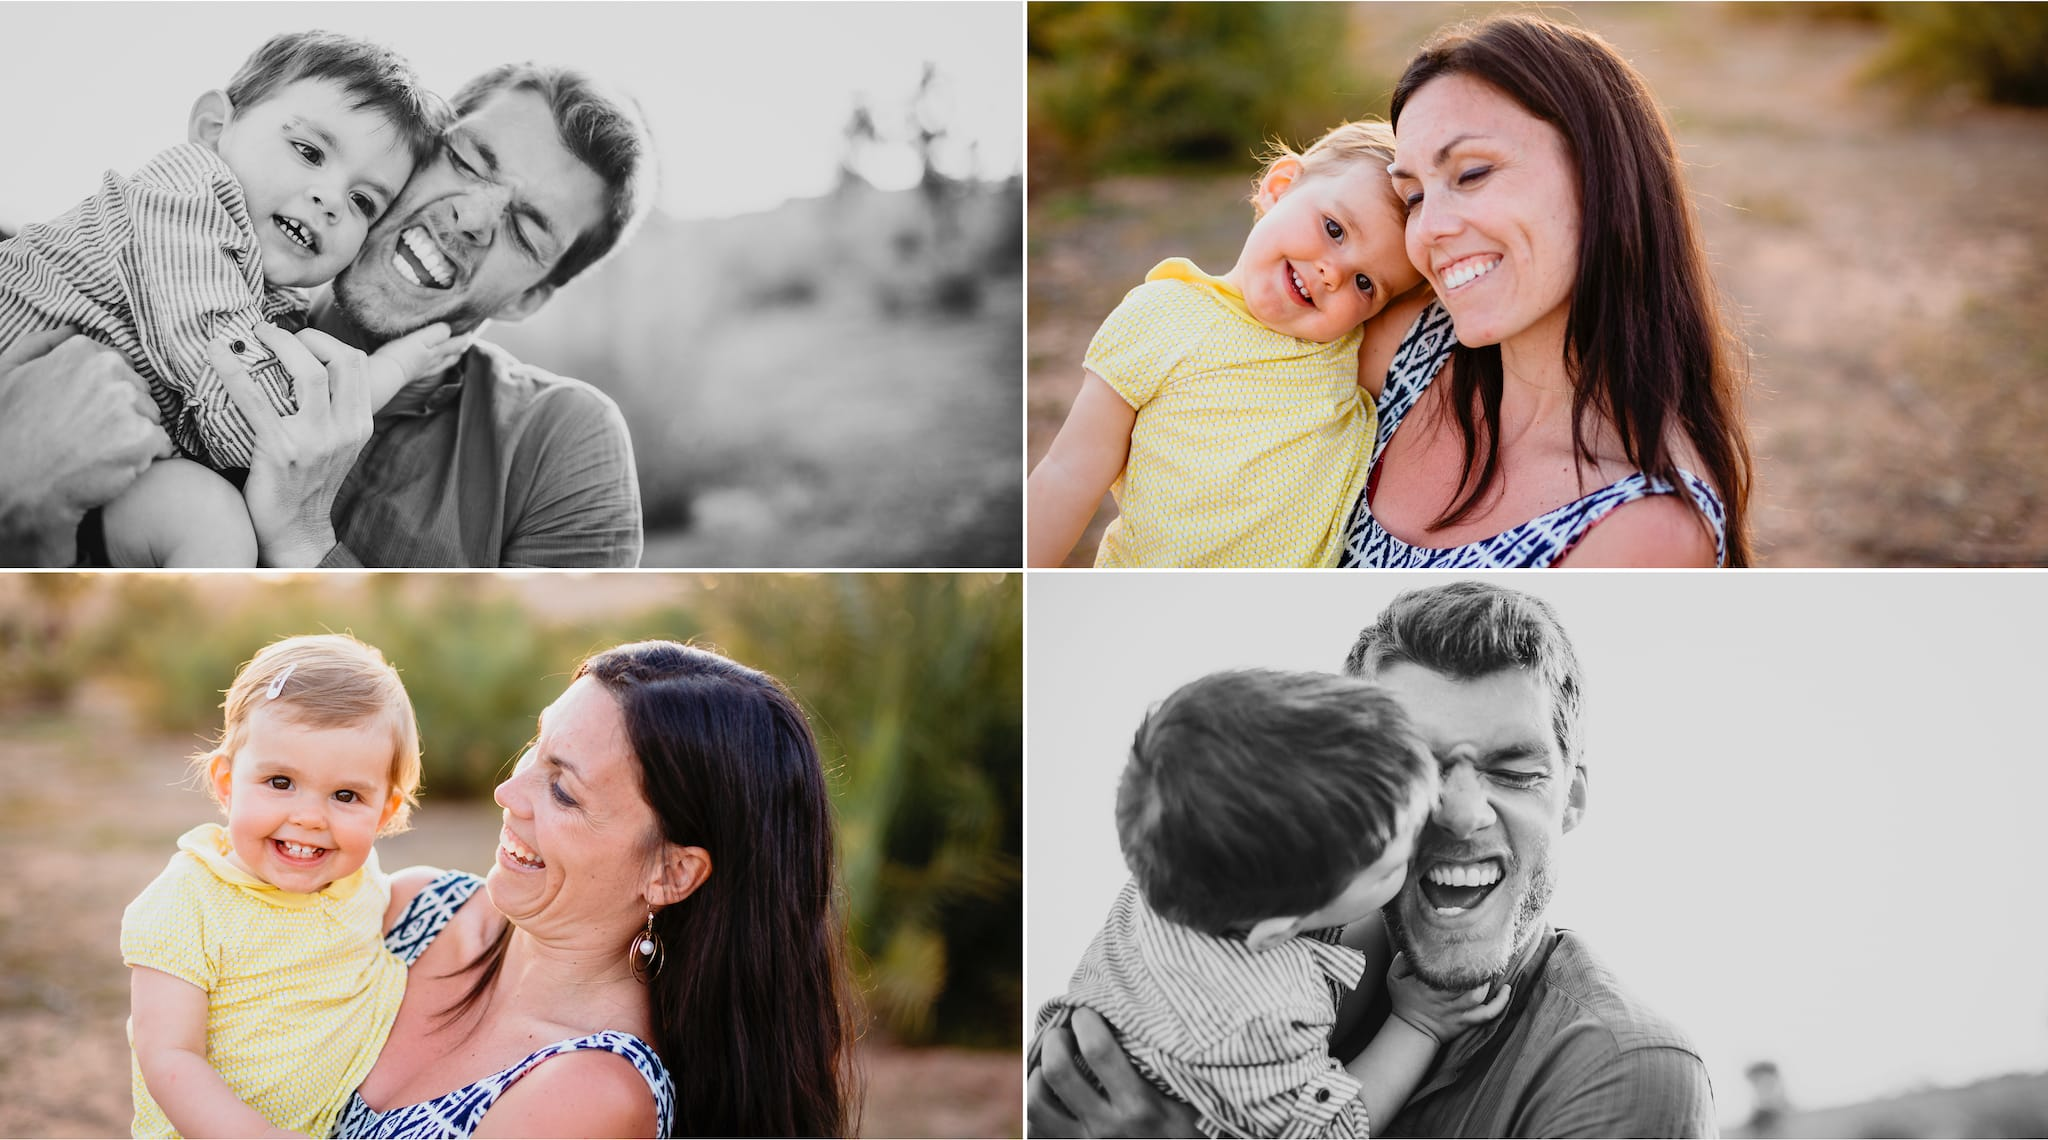 marrakesh ; maroc ; photographe ; shooting photo famille